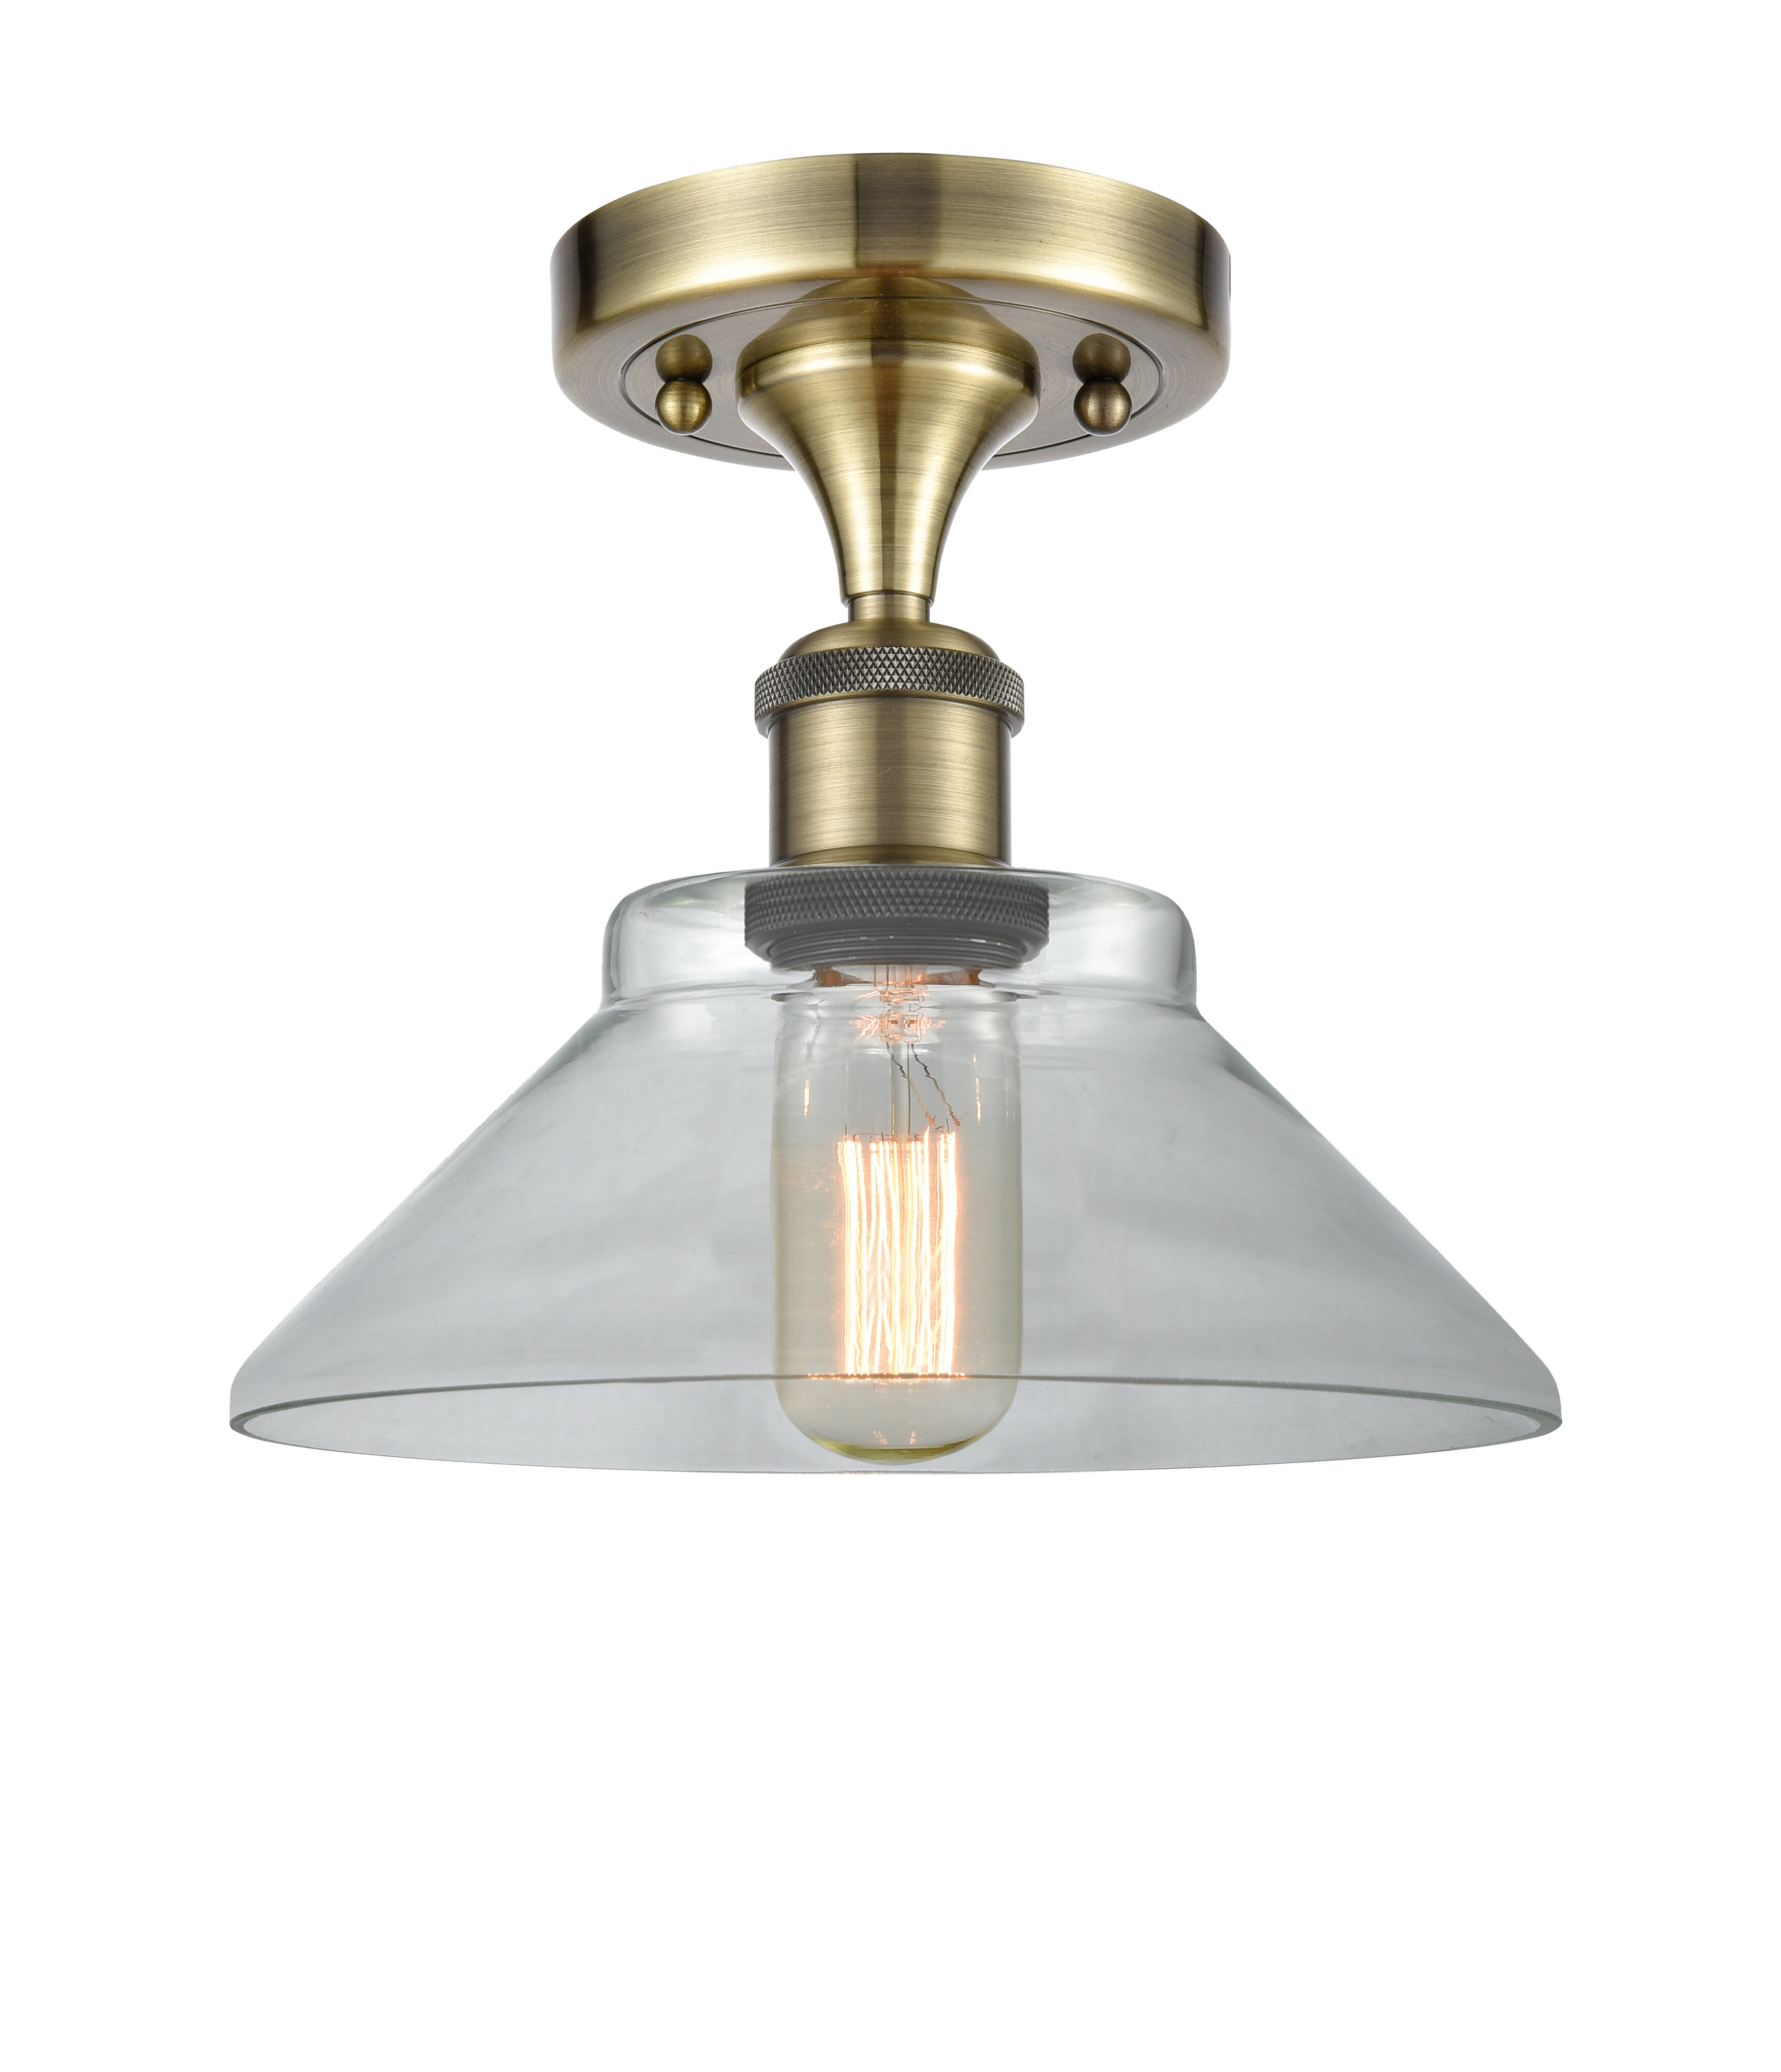 Gracie Oaks Nyle 1 Light 9 Simple Cone Semi Flush Mount Reviews Wayfair